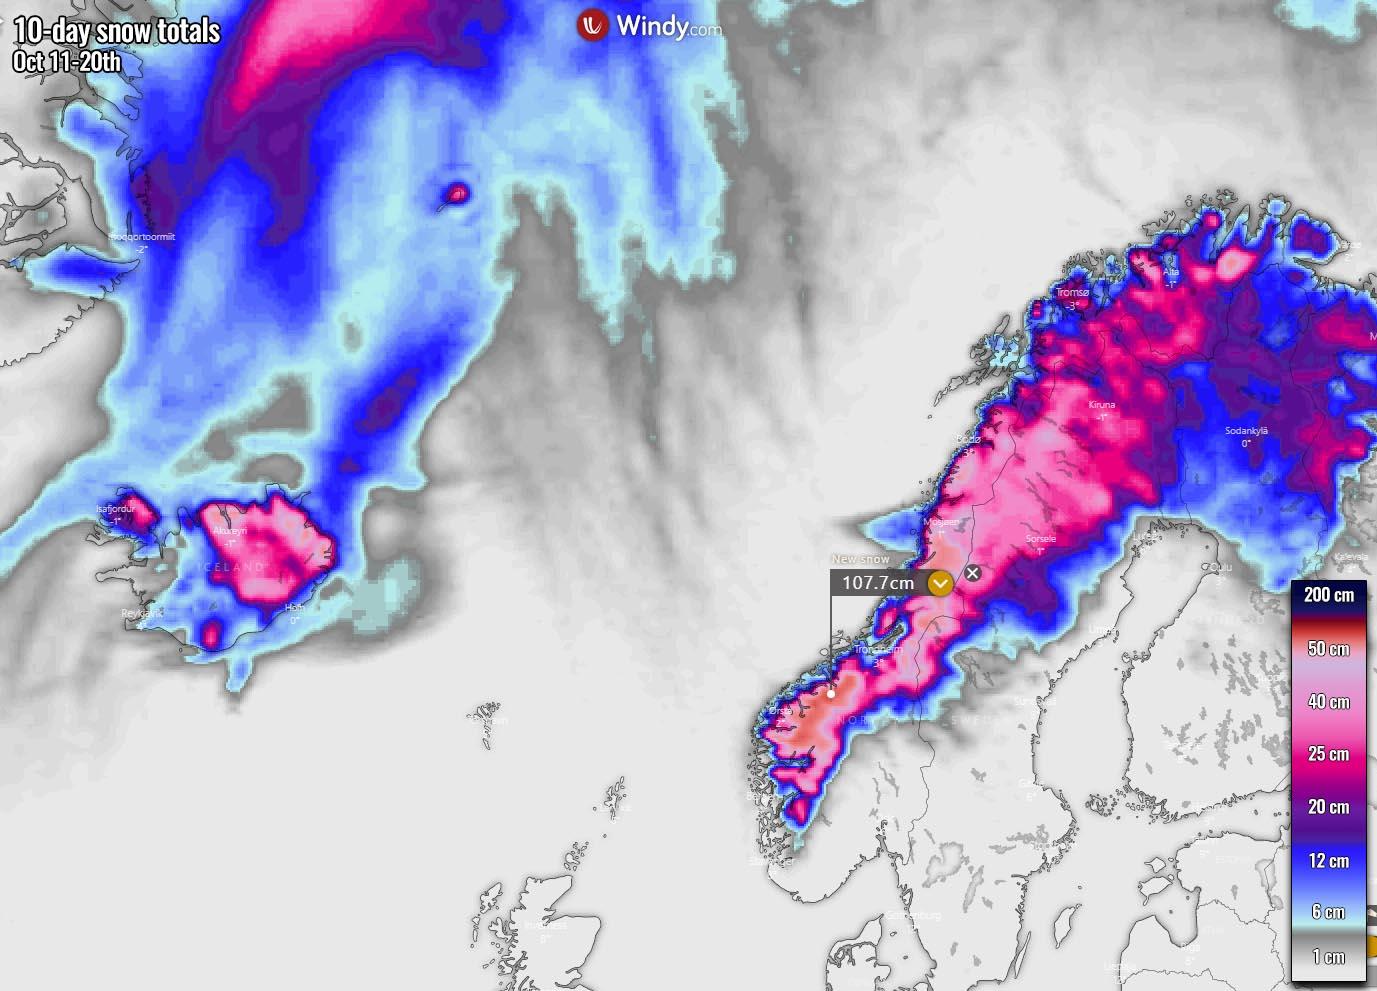 cold-blast-forecast-mid-october-european-continent-snow